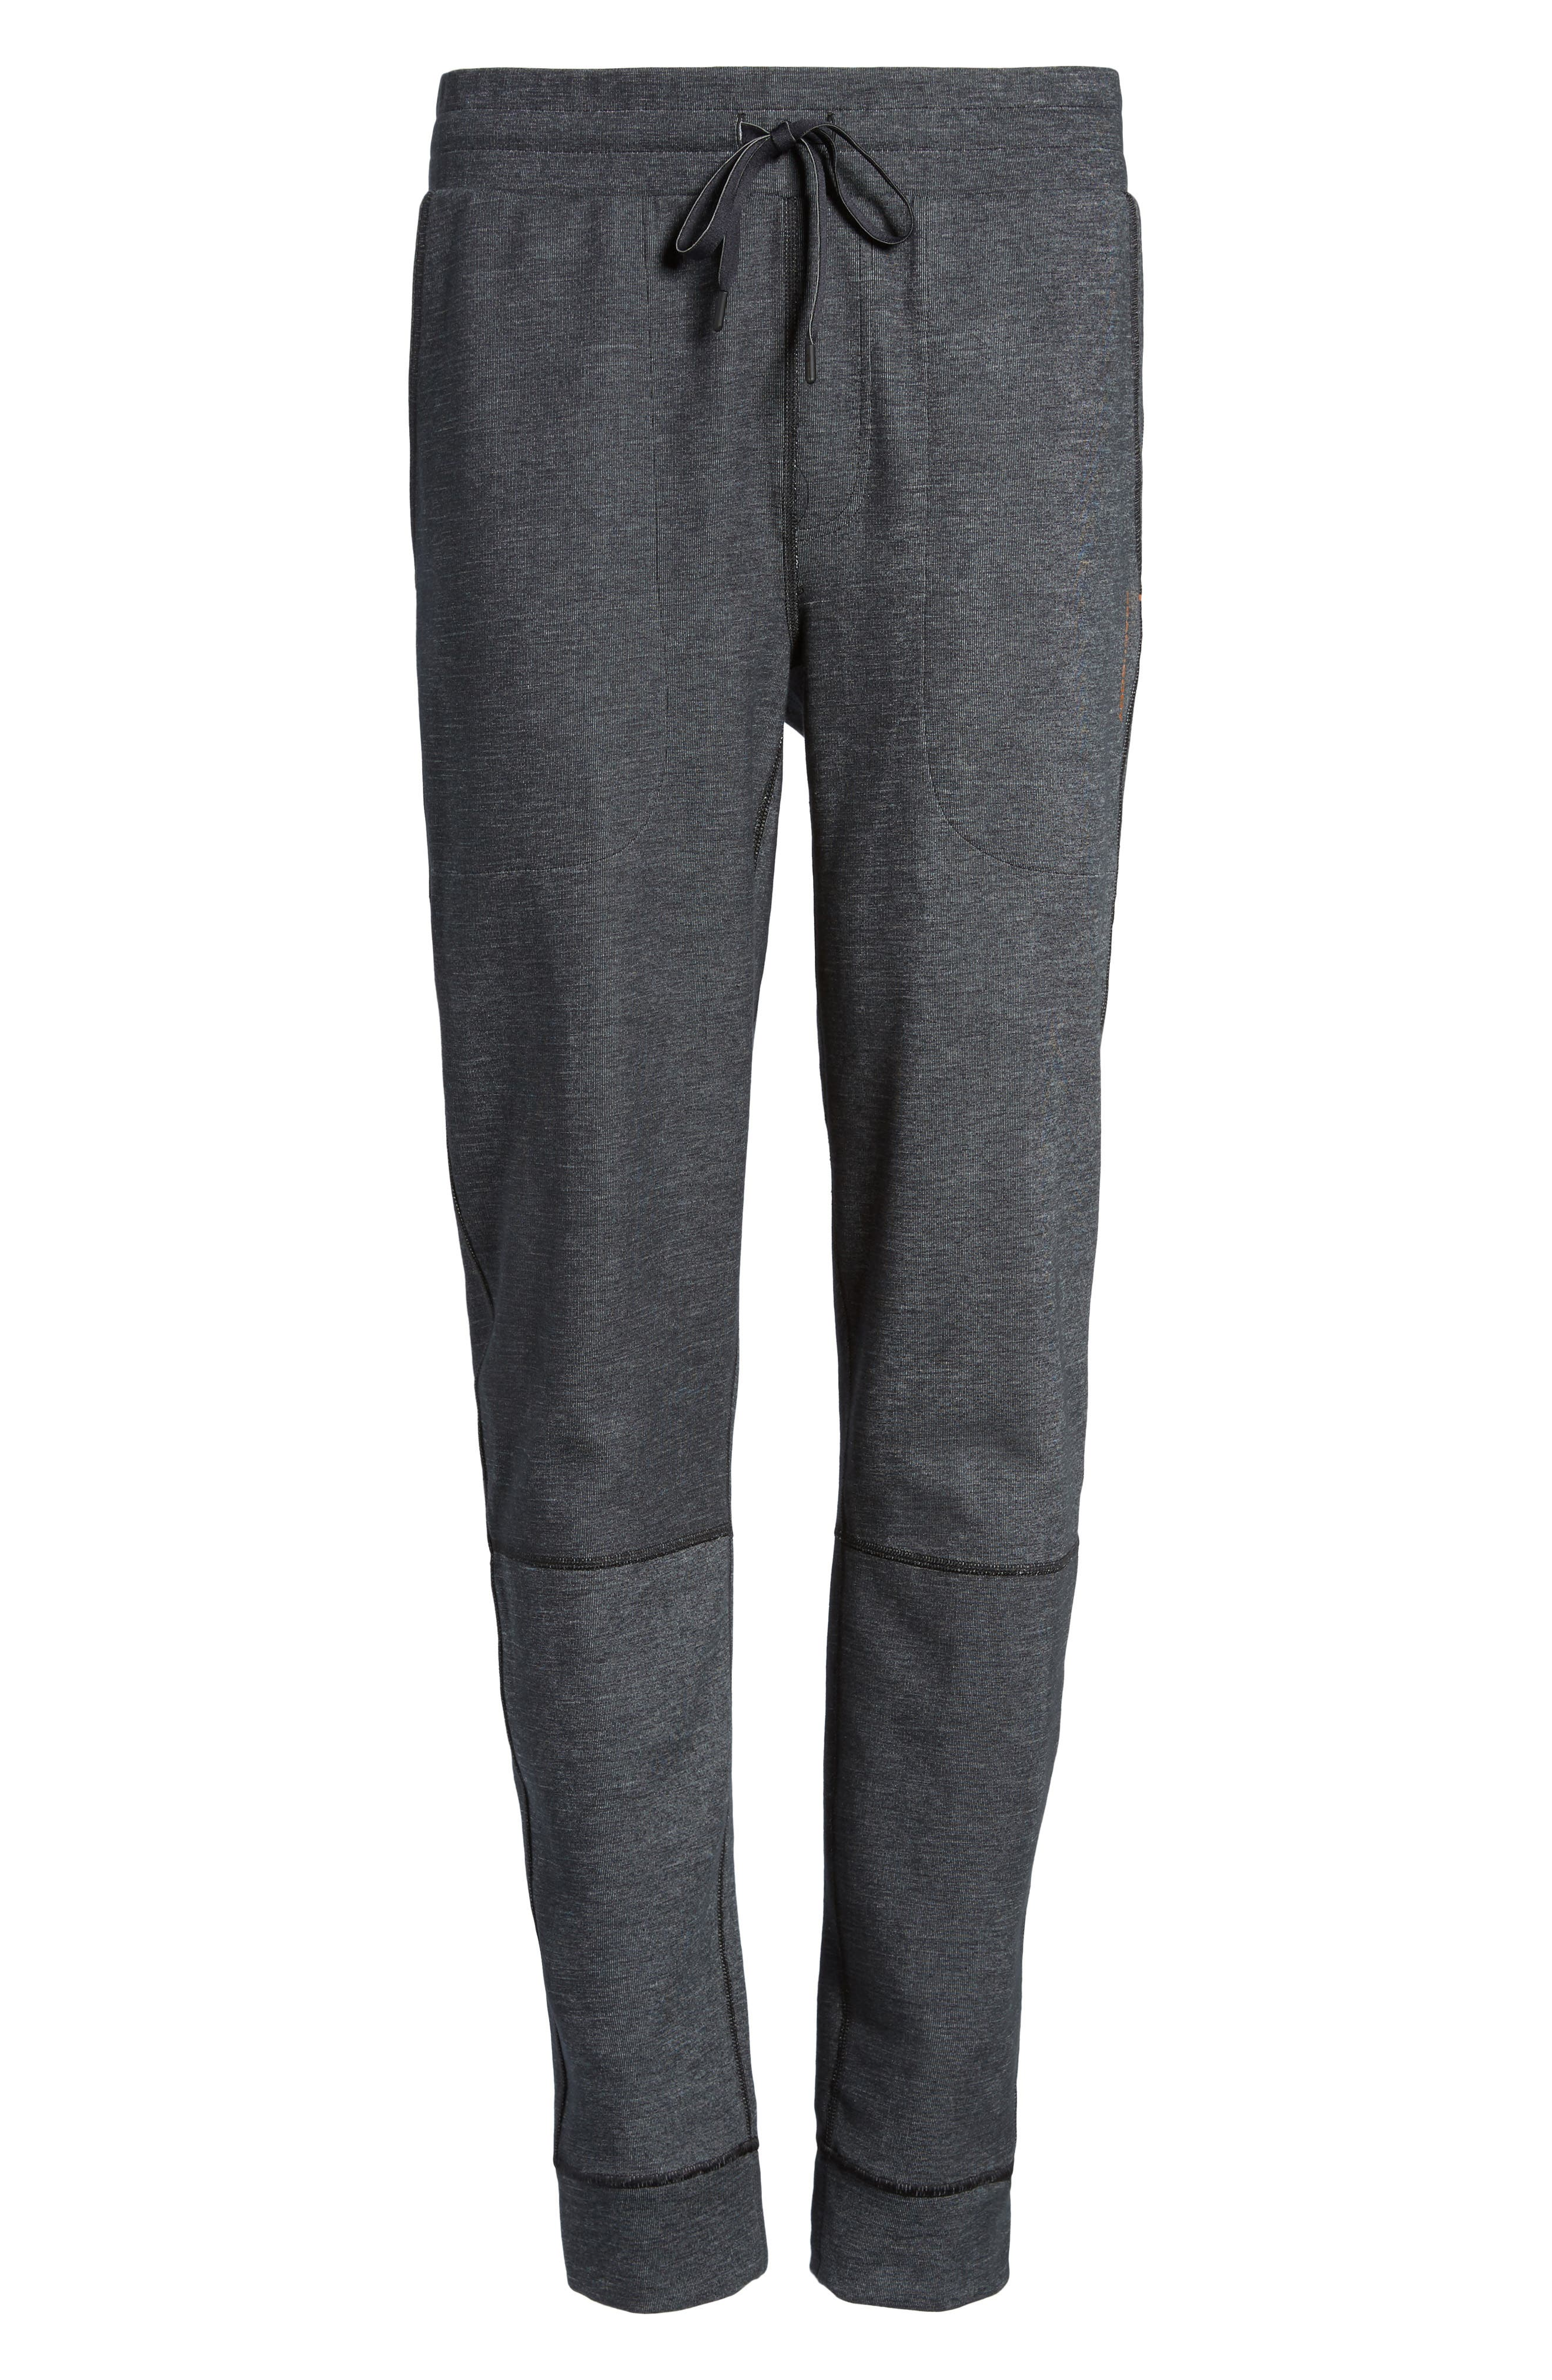 Slim Fit Fusion Jogger Pants,                             Alternate thumbnail 6, color,                             001